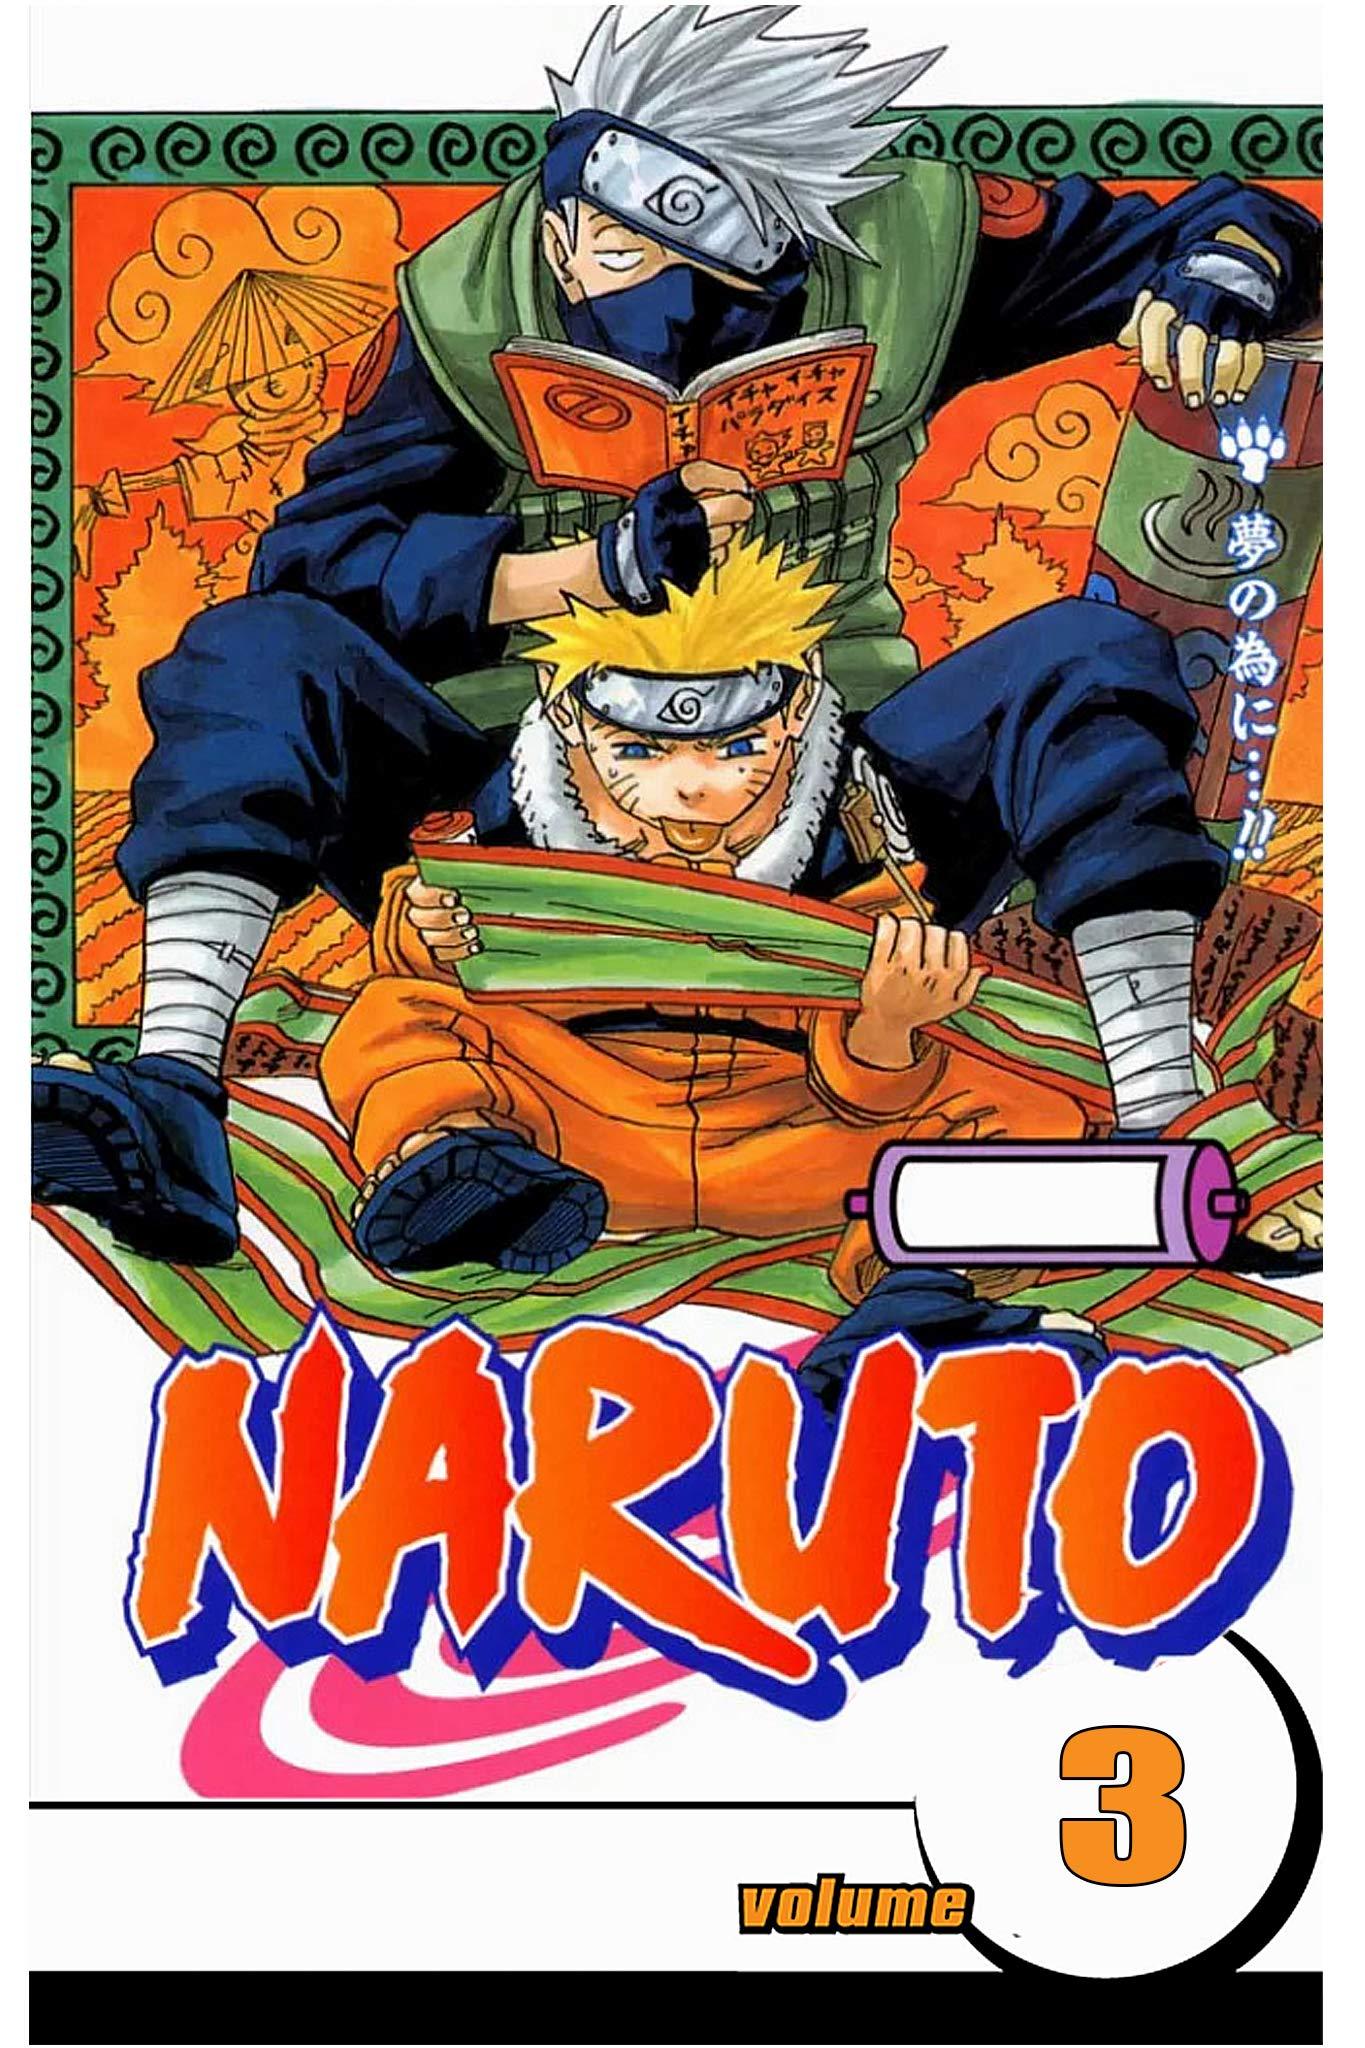 Naruto: Uzumaki Volume 3